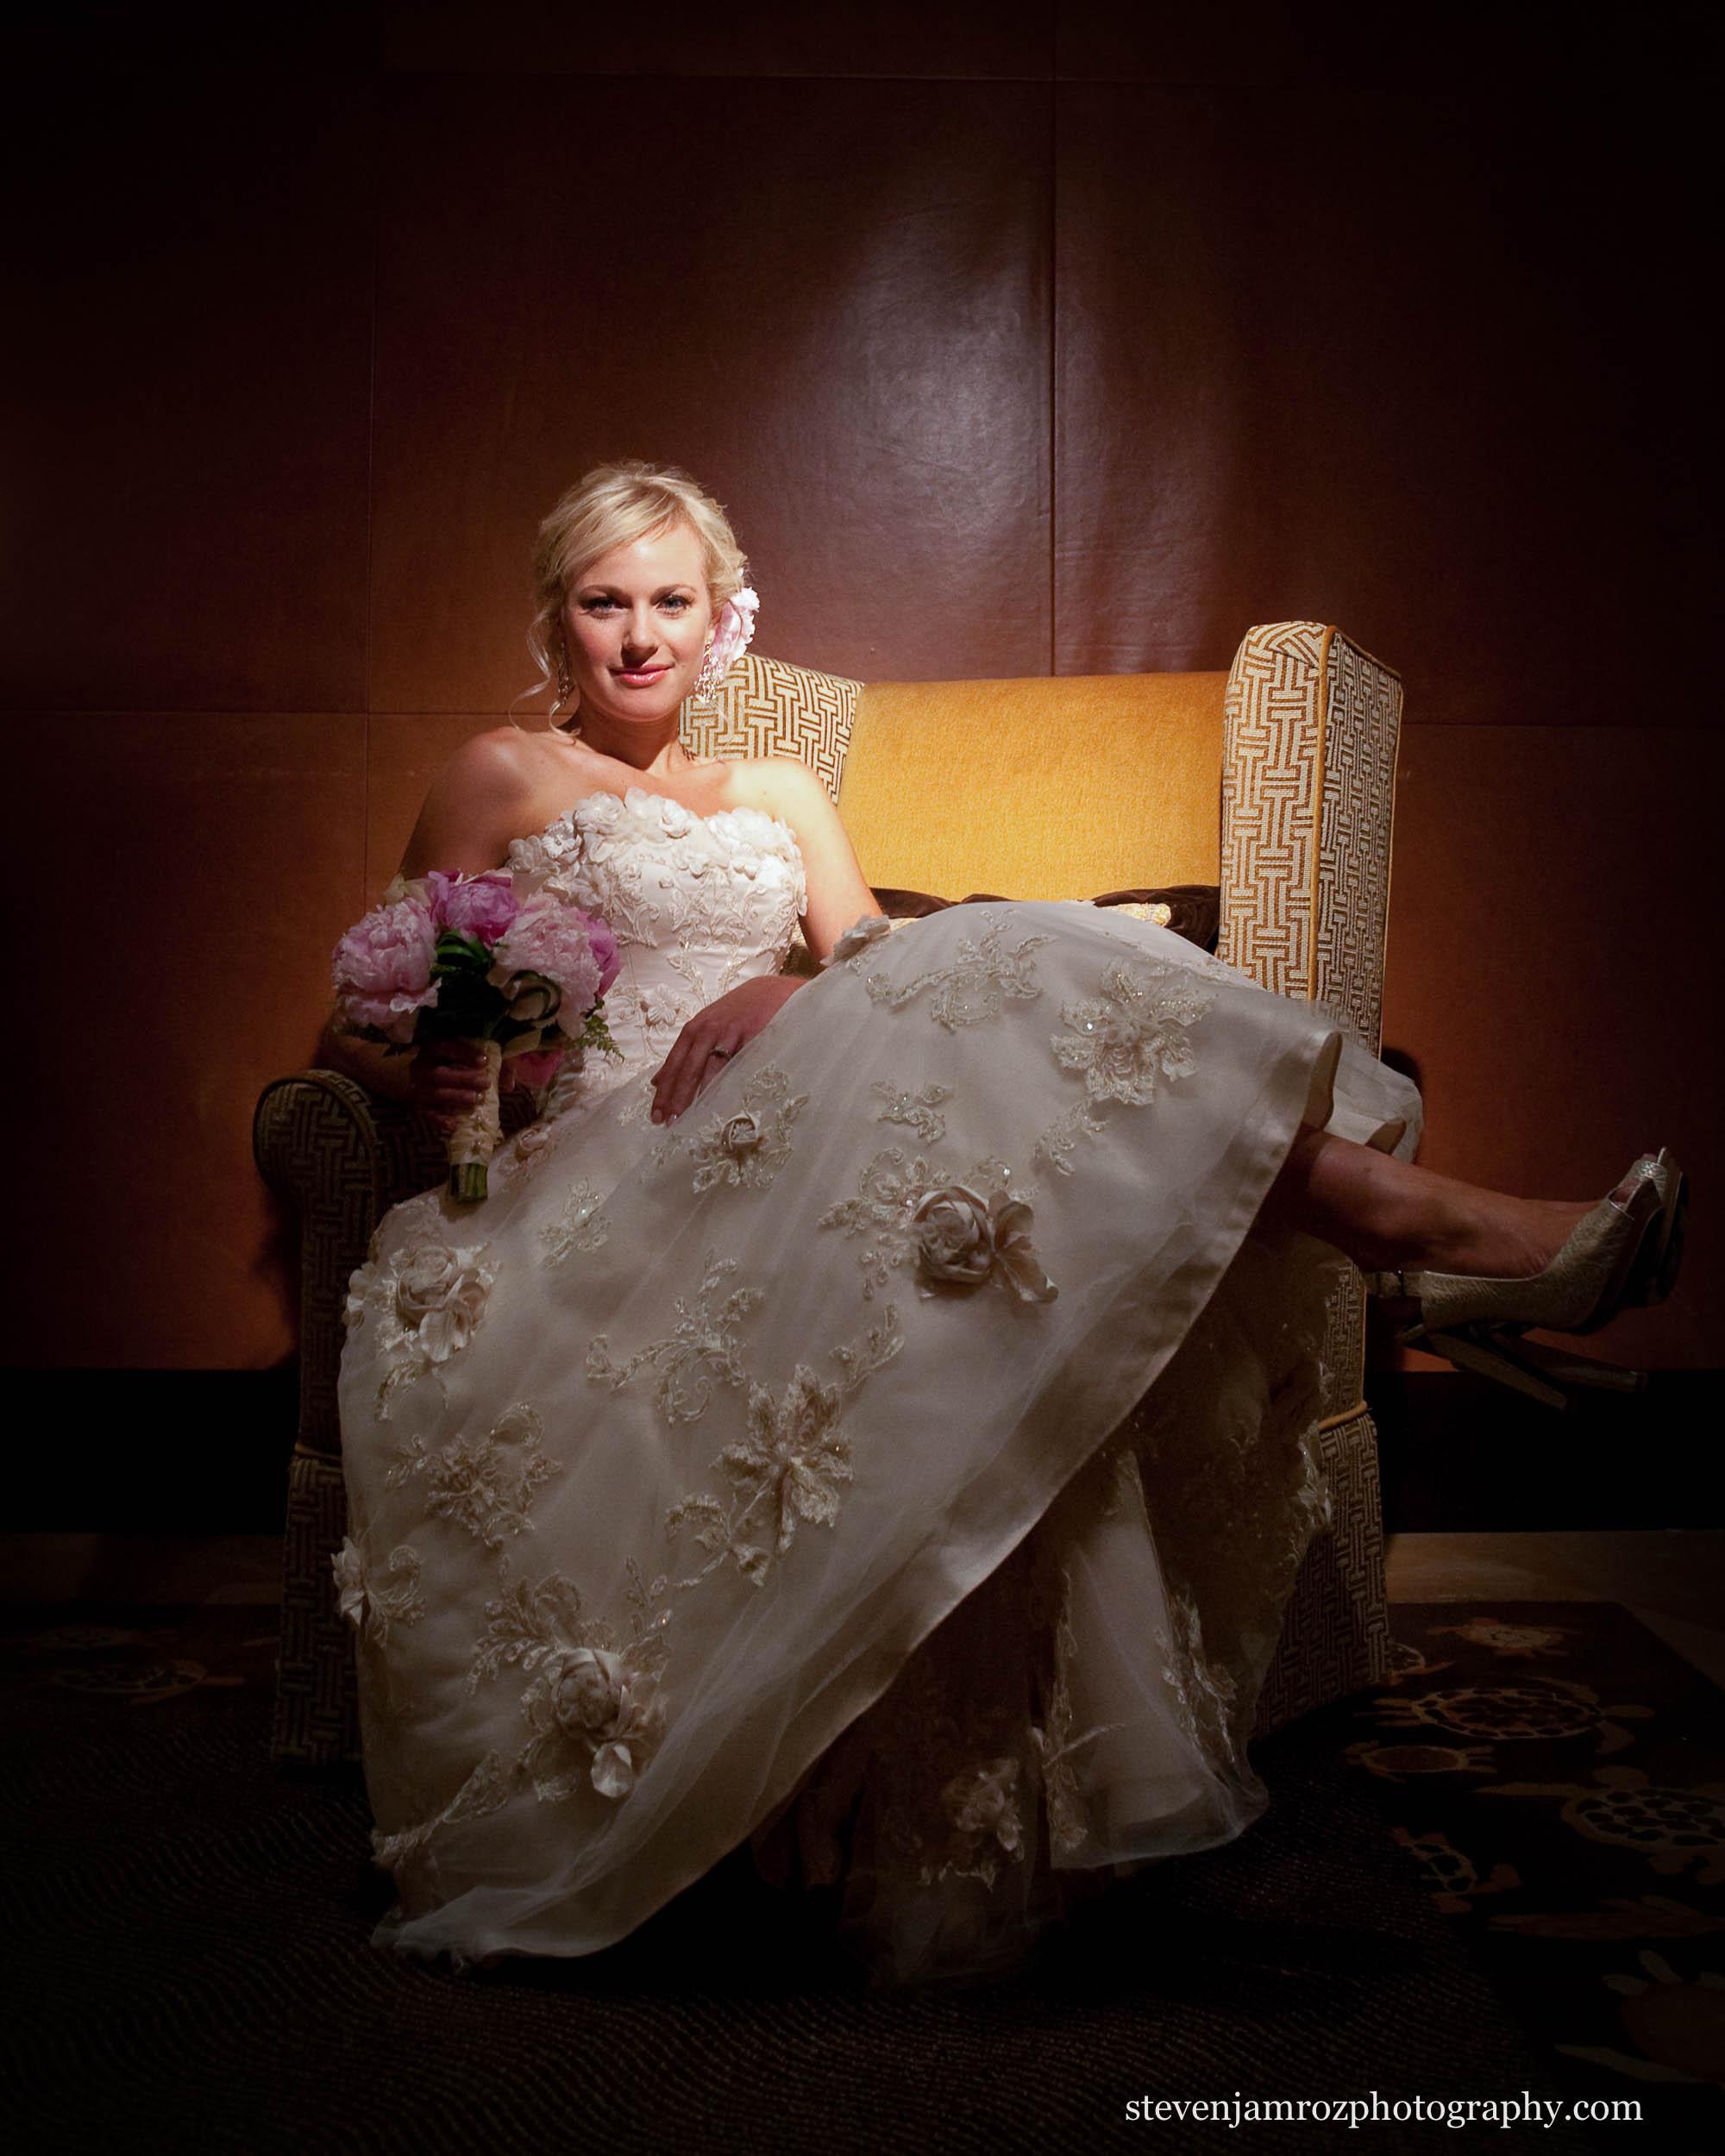 lighting-portrait-of-bride-steven-jamroz-photography-0476.jpg